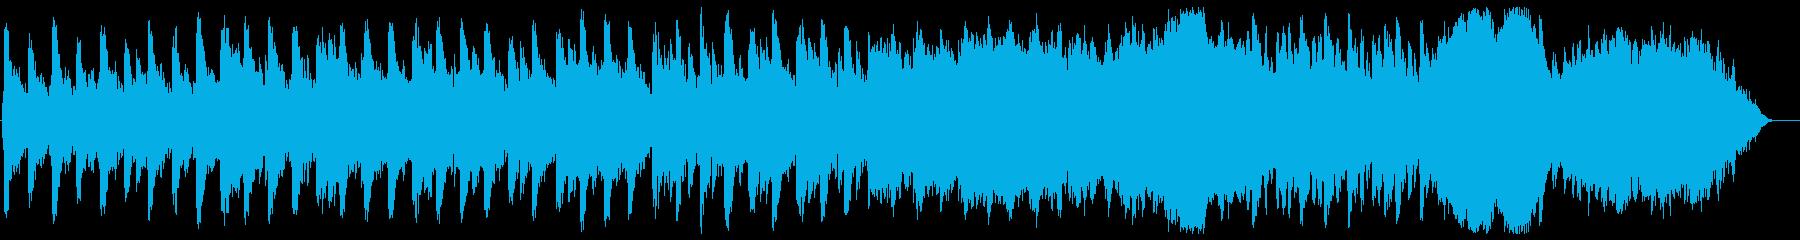 Avemaria (Guno)'s reproduced waveform